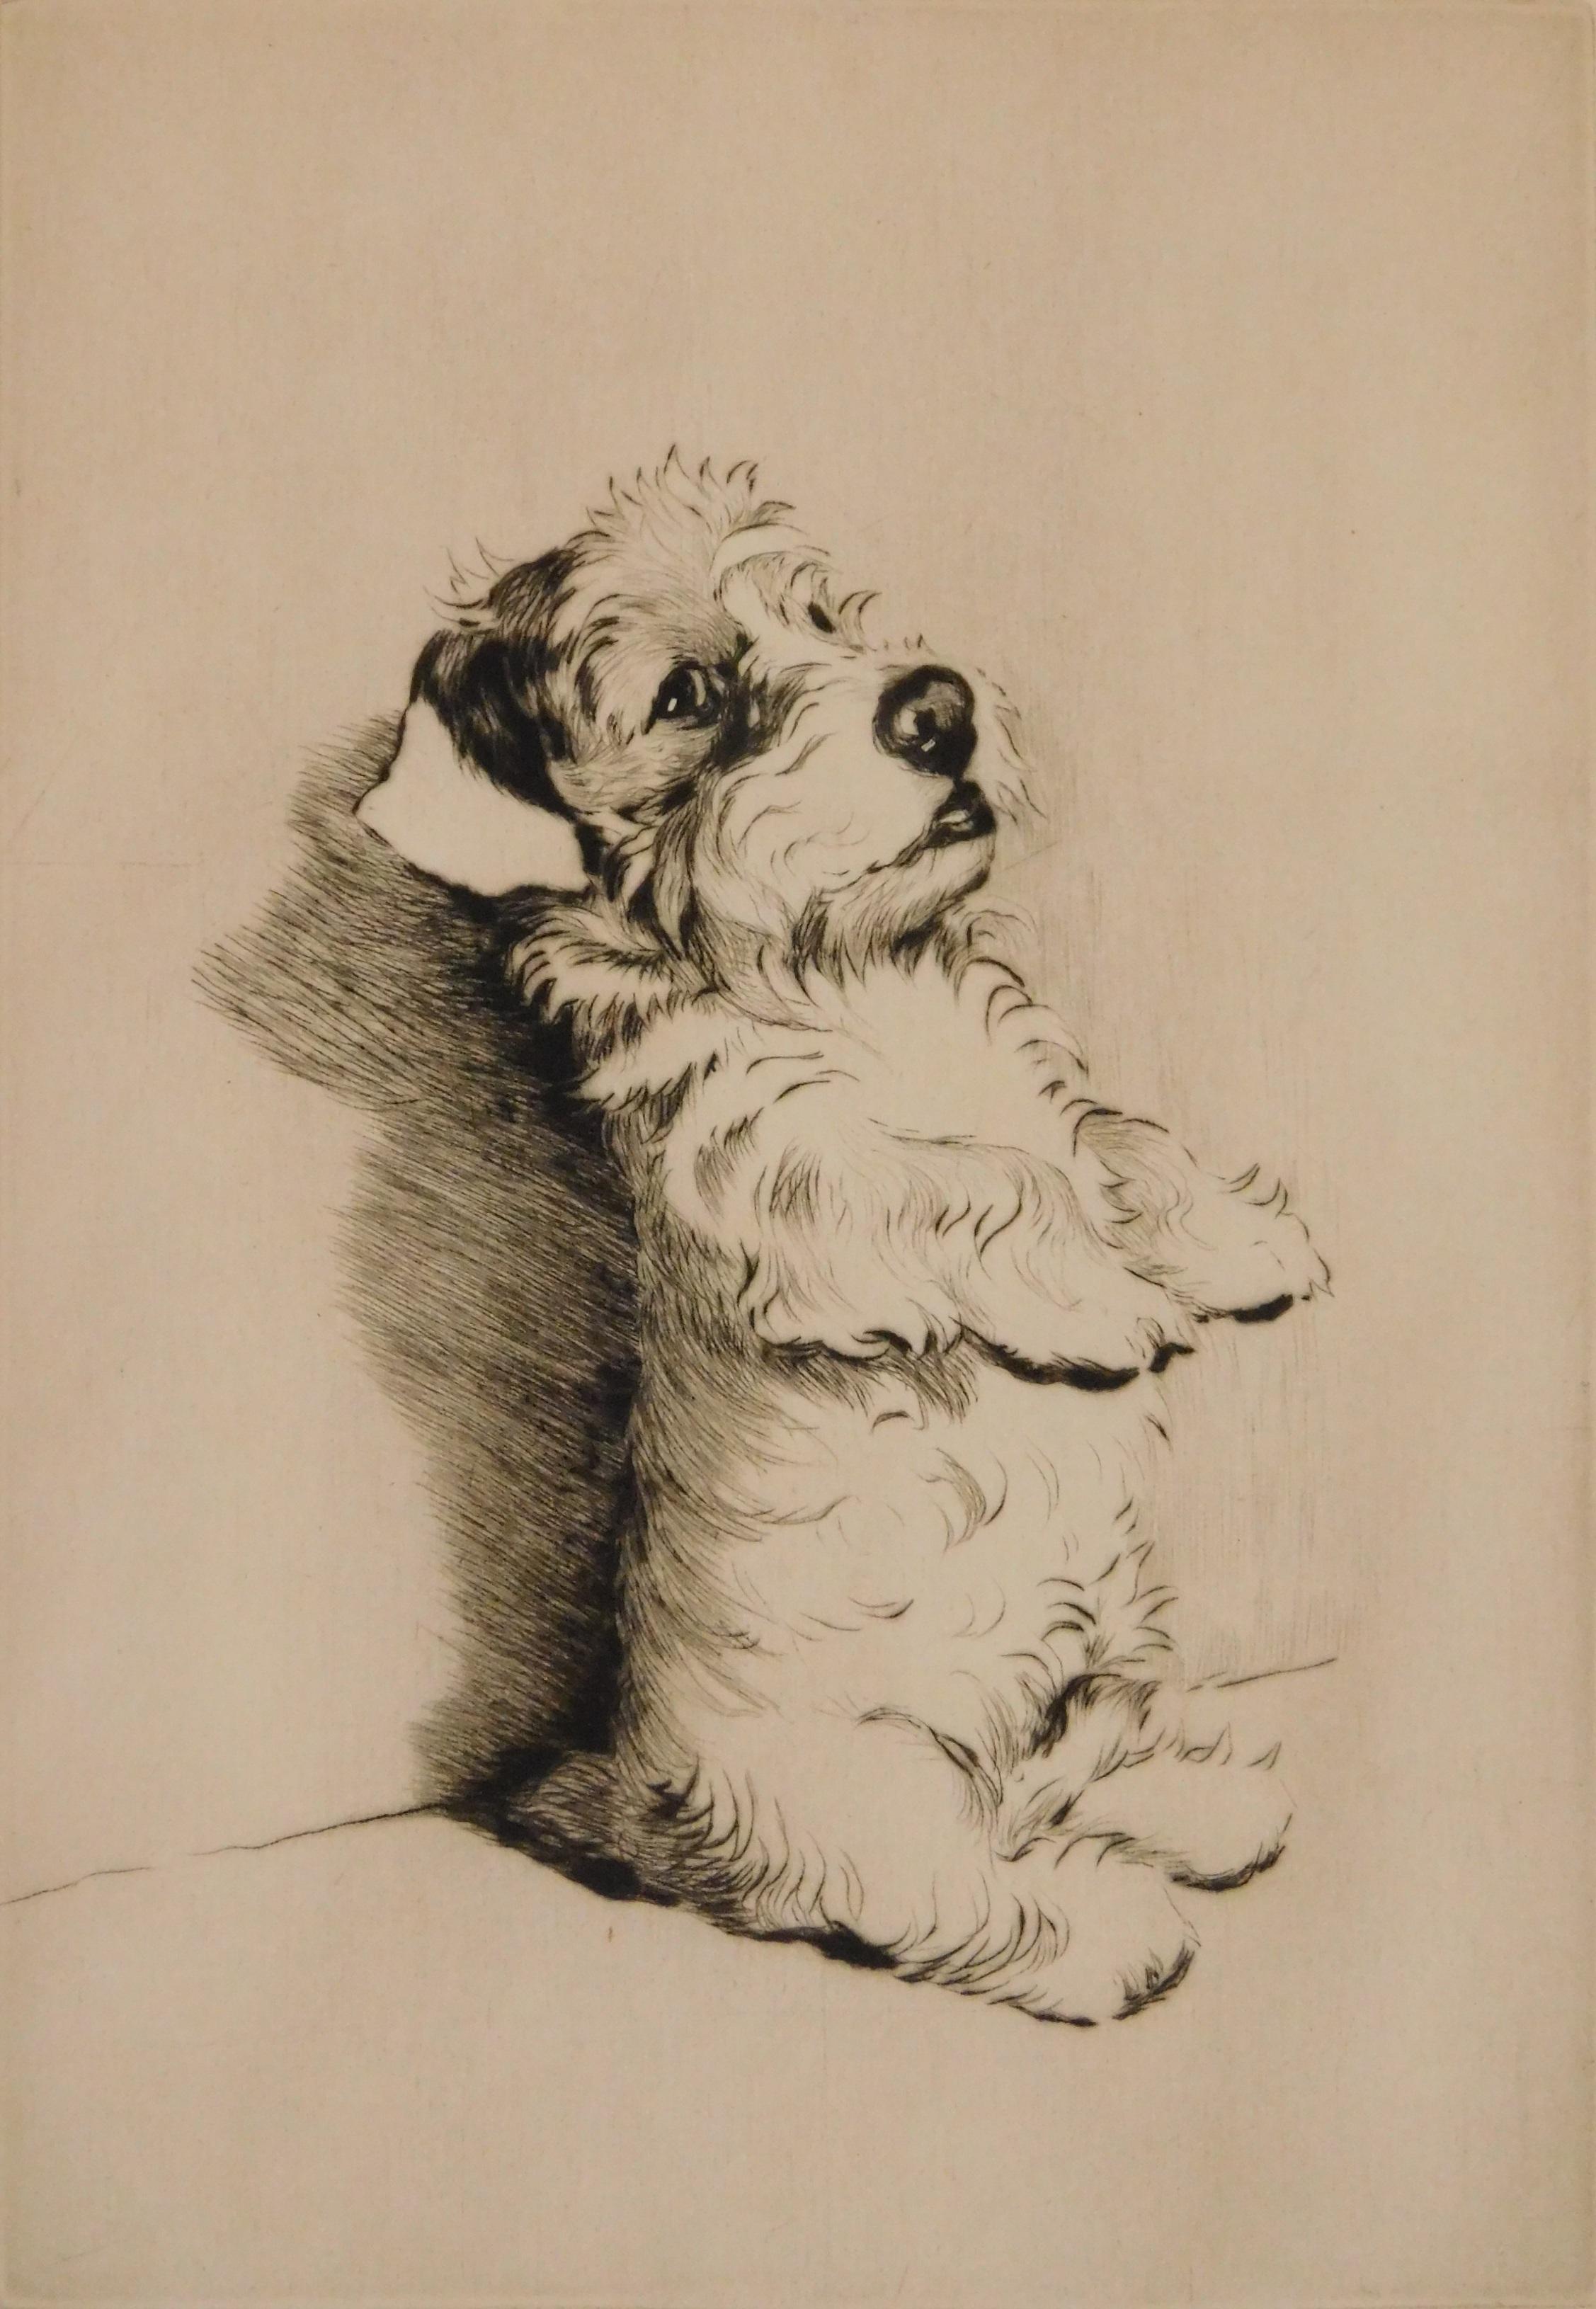 Prints, Drawings, Fine & Decorative Arts - Sale 219